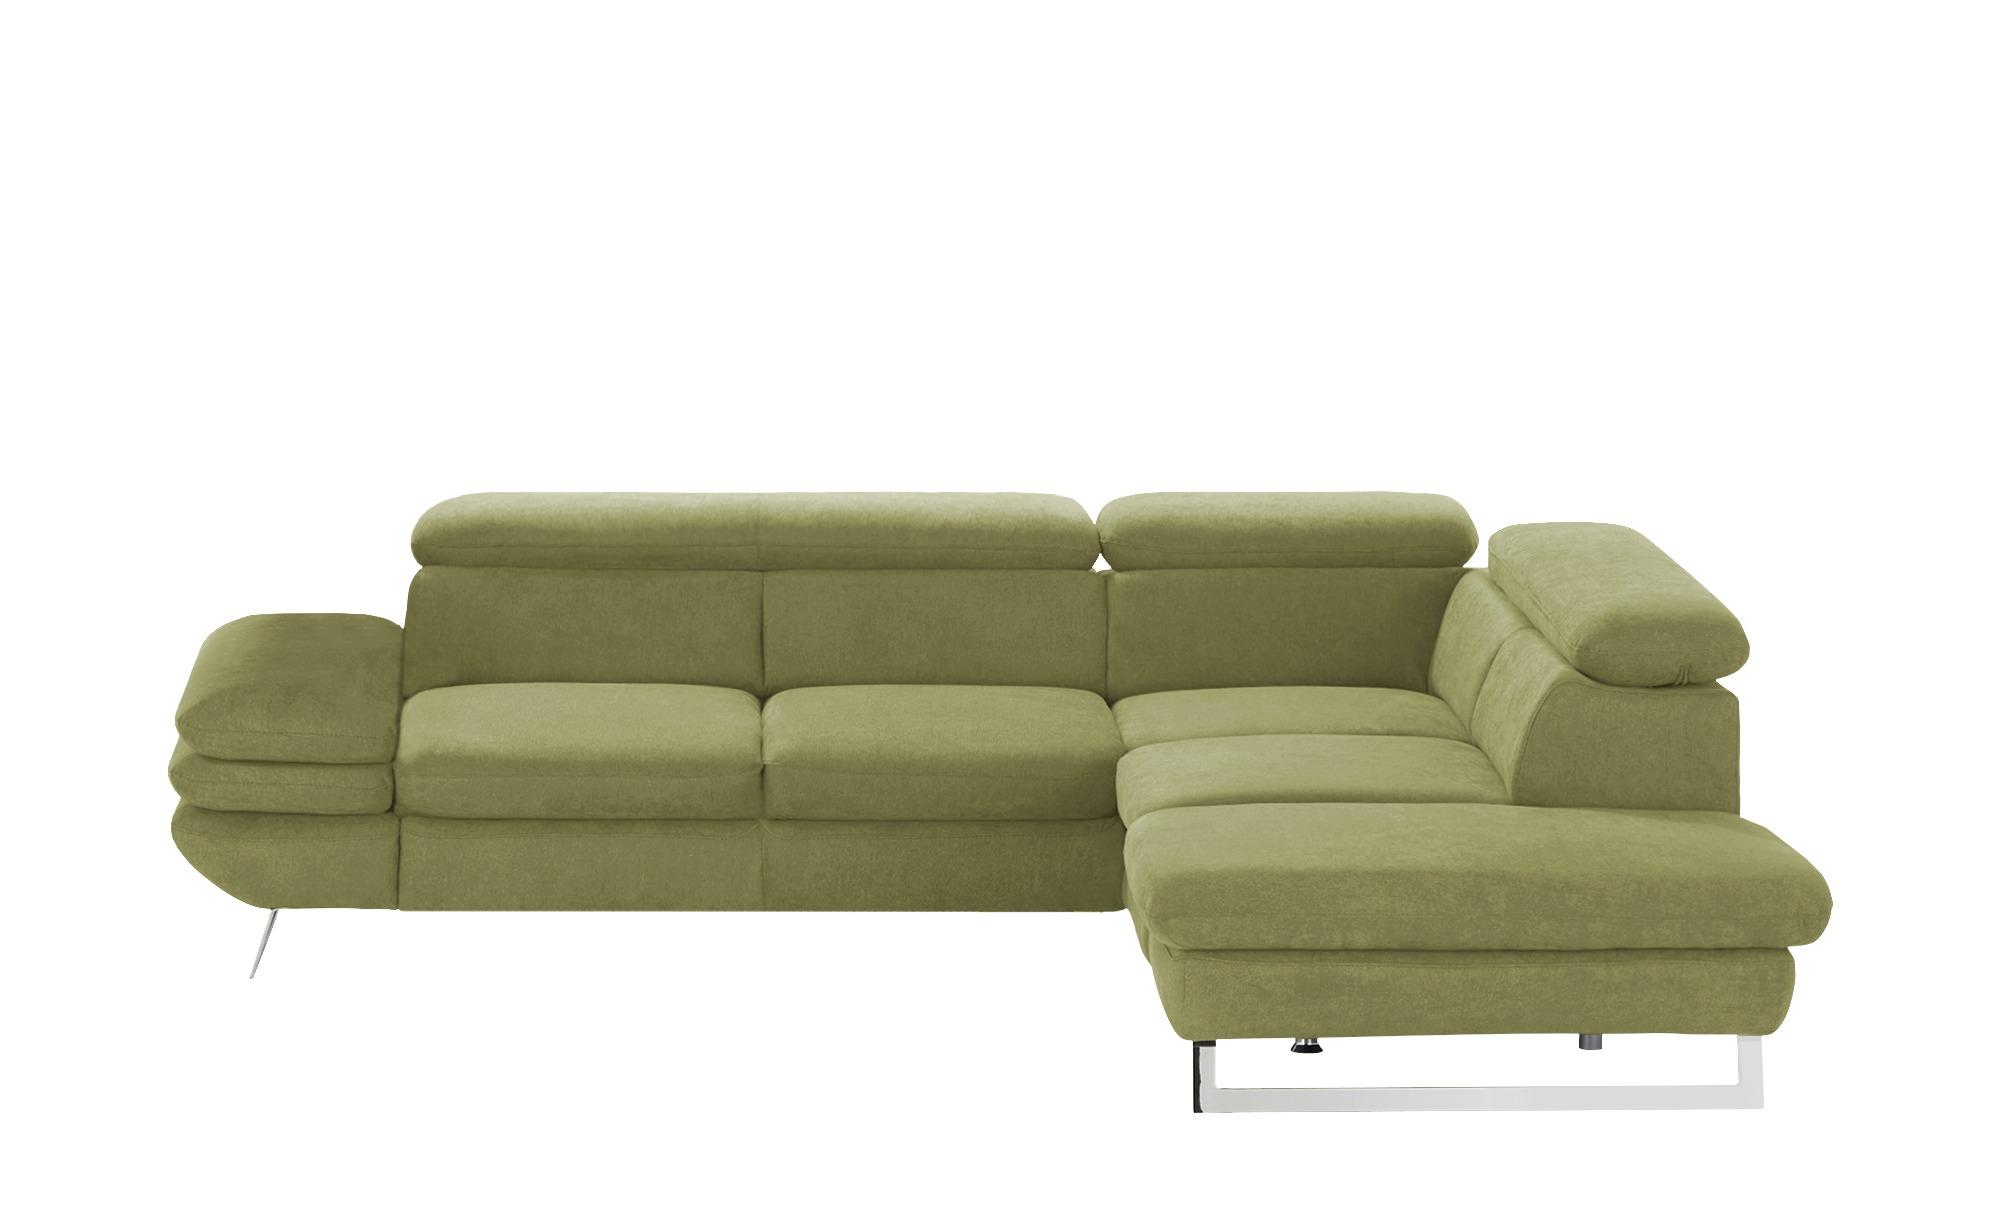 uno Ecksofa  Preston ¦ grün ¦ Maße (cm): H: 74 Polstermöbel > Sofas > Ecksofas - Höffner